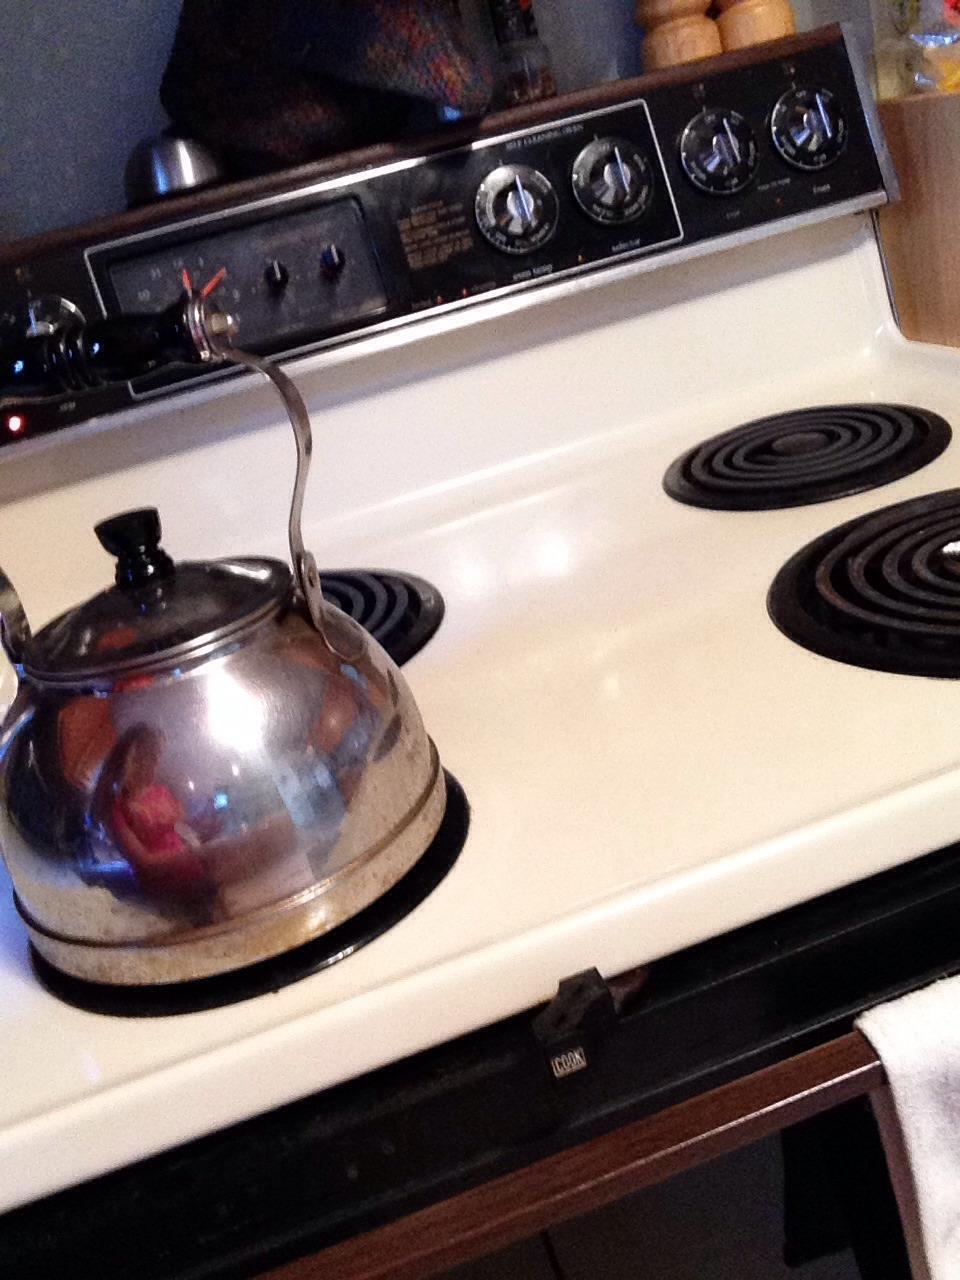 1st boil water